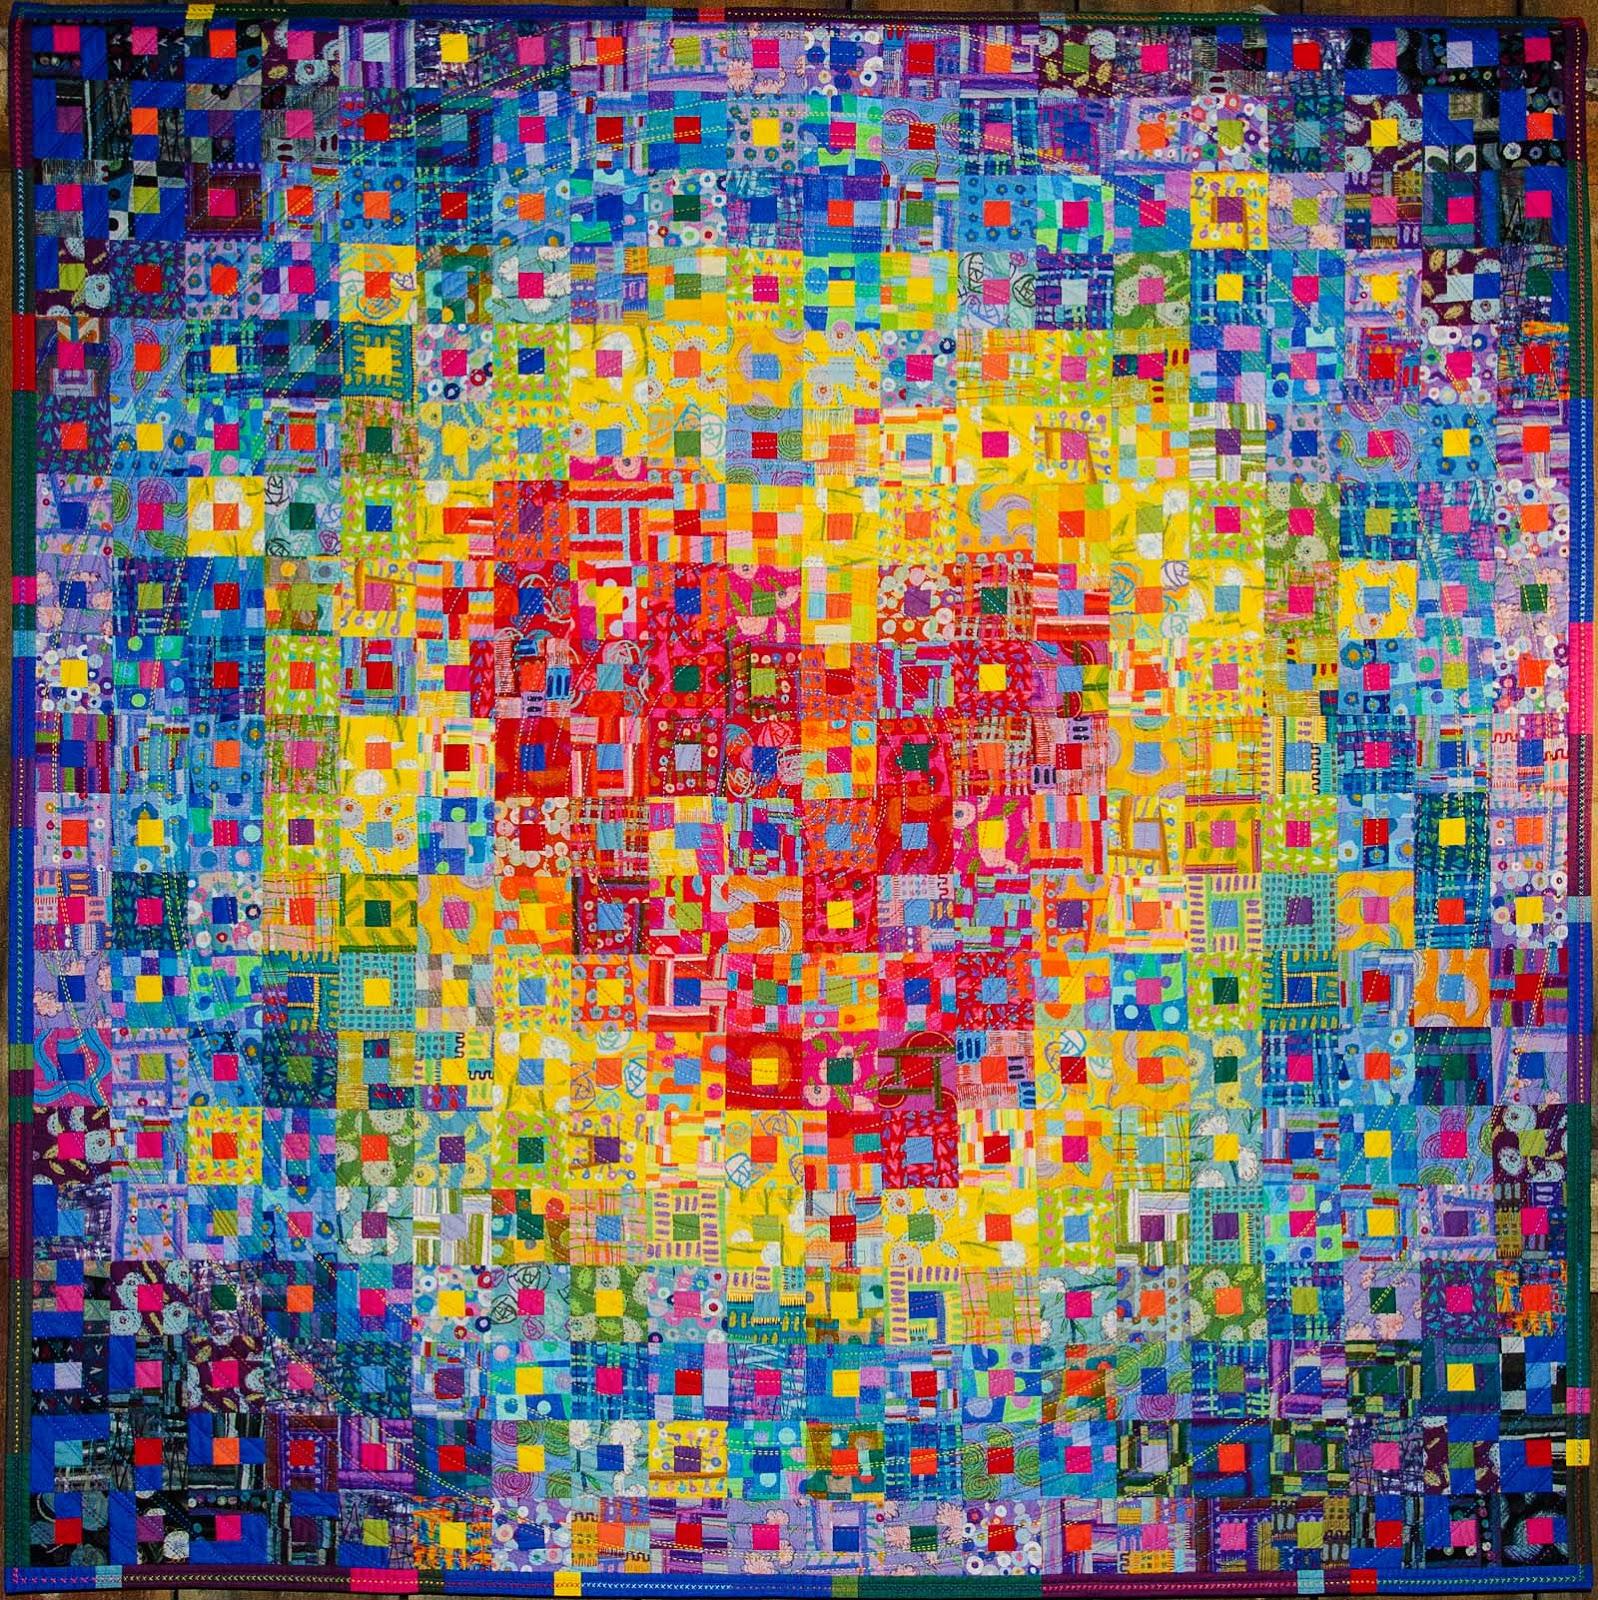 Nihon Japanese heart quilt by Kikuyo Miyashita